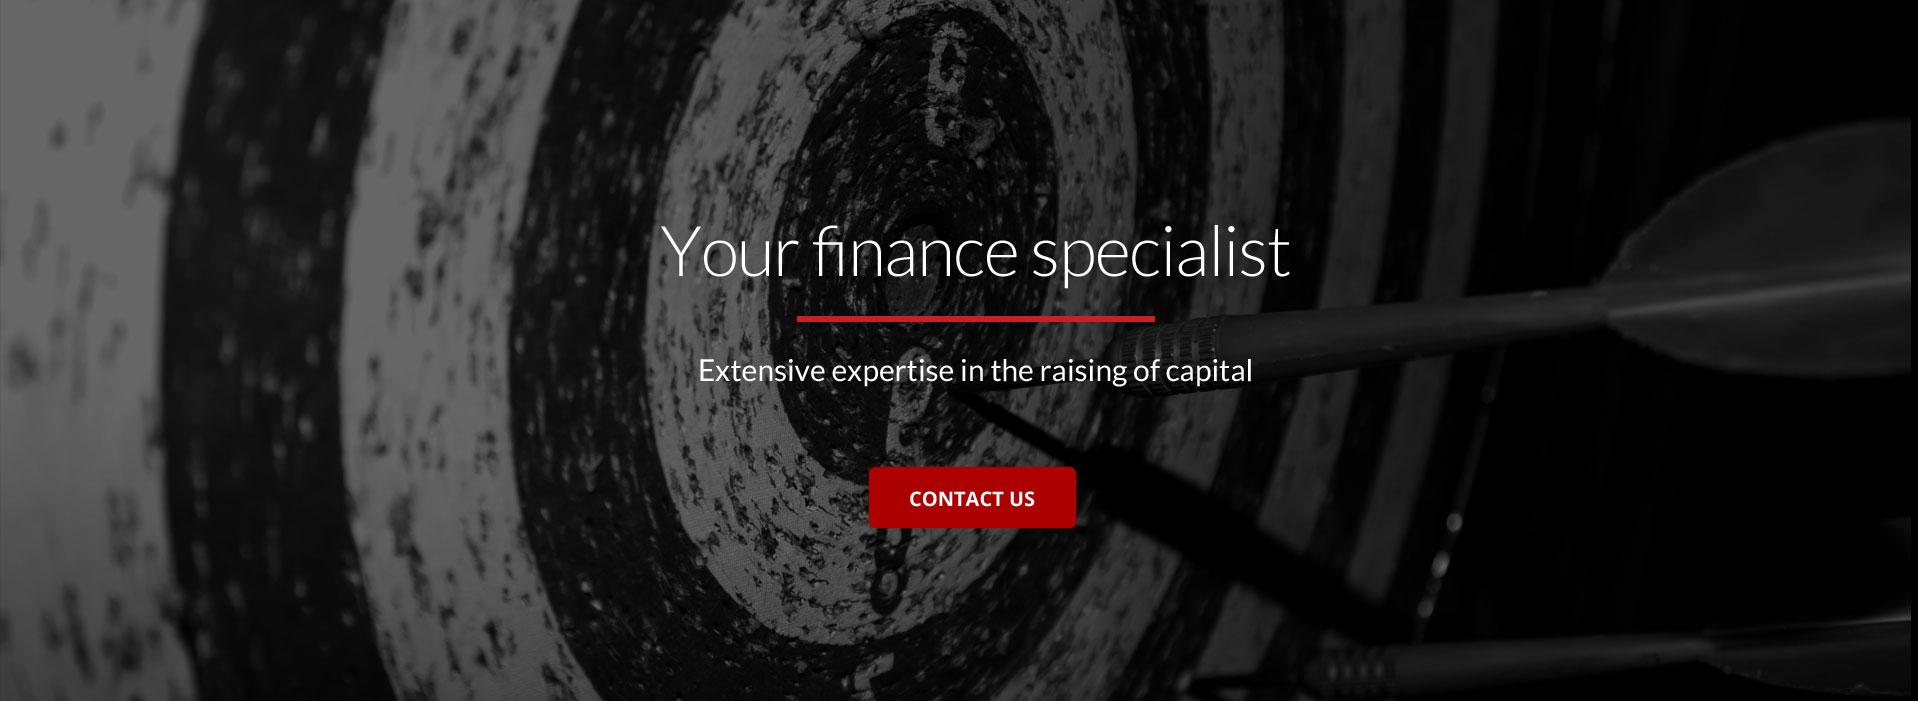 01-finance-specialist